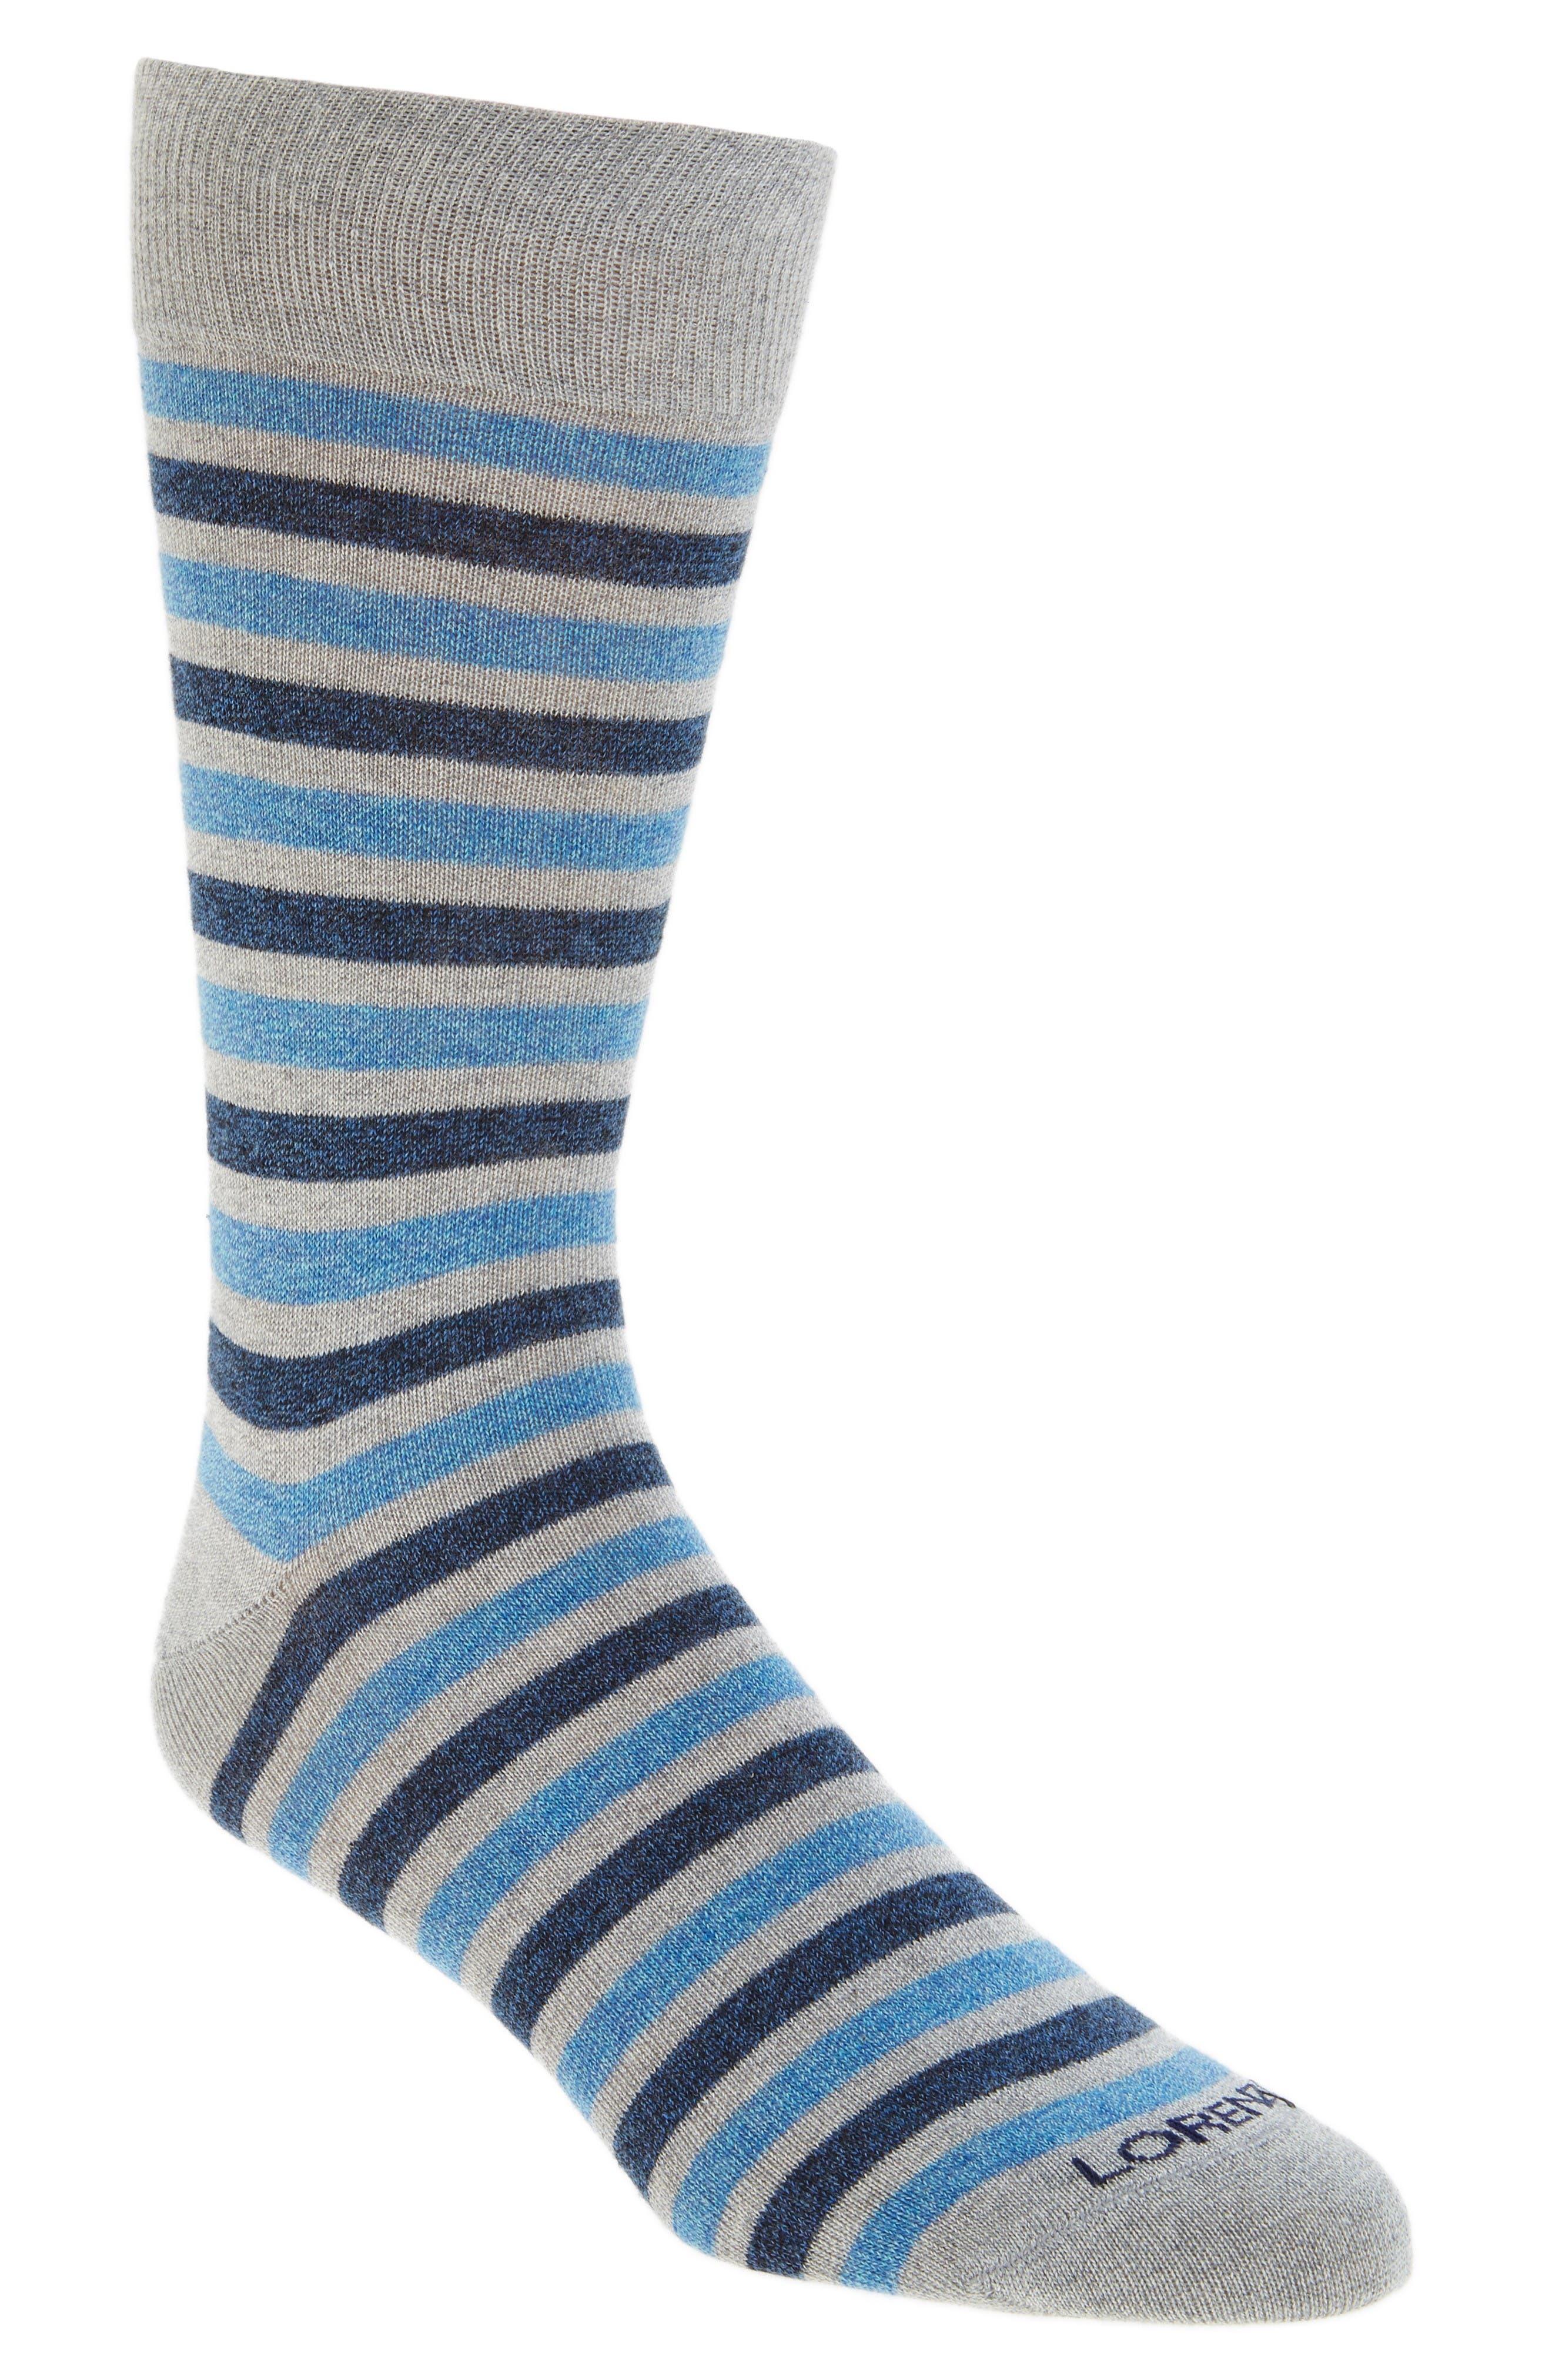 LORENZO UOMO Double Stripe Crew Socks